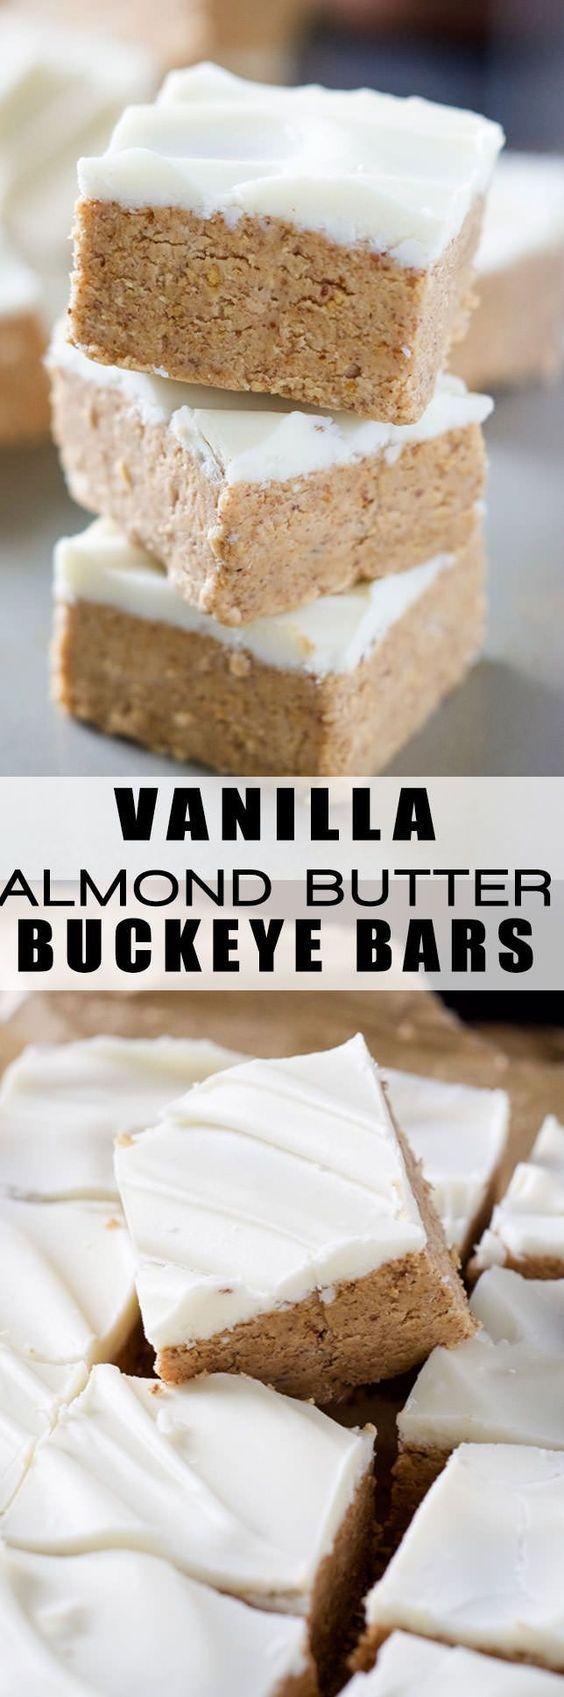 Easy Gluten Free Buckeye Bars Recipe   Desserts, Powdered Sugar, Chocolate, Parties, Snacks, Kids, Gifts